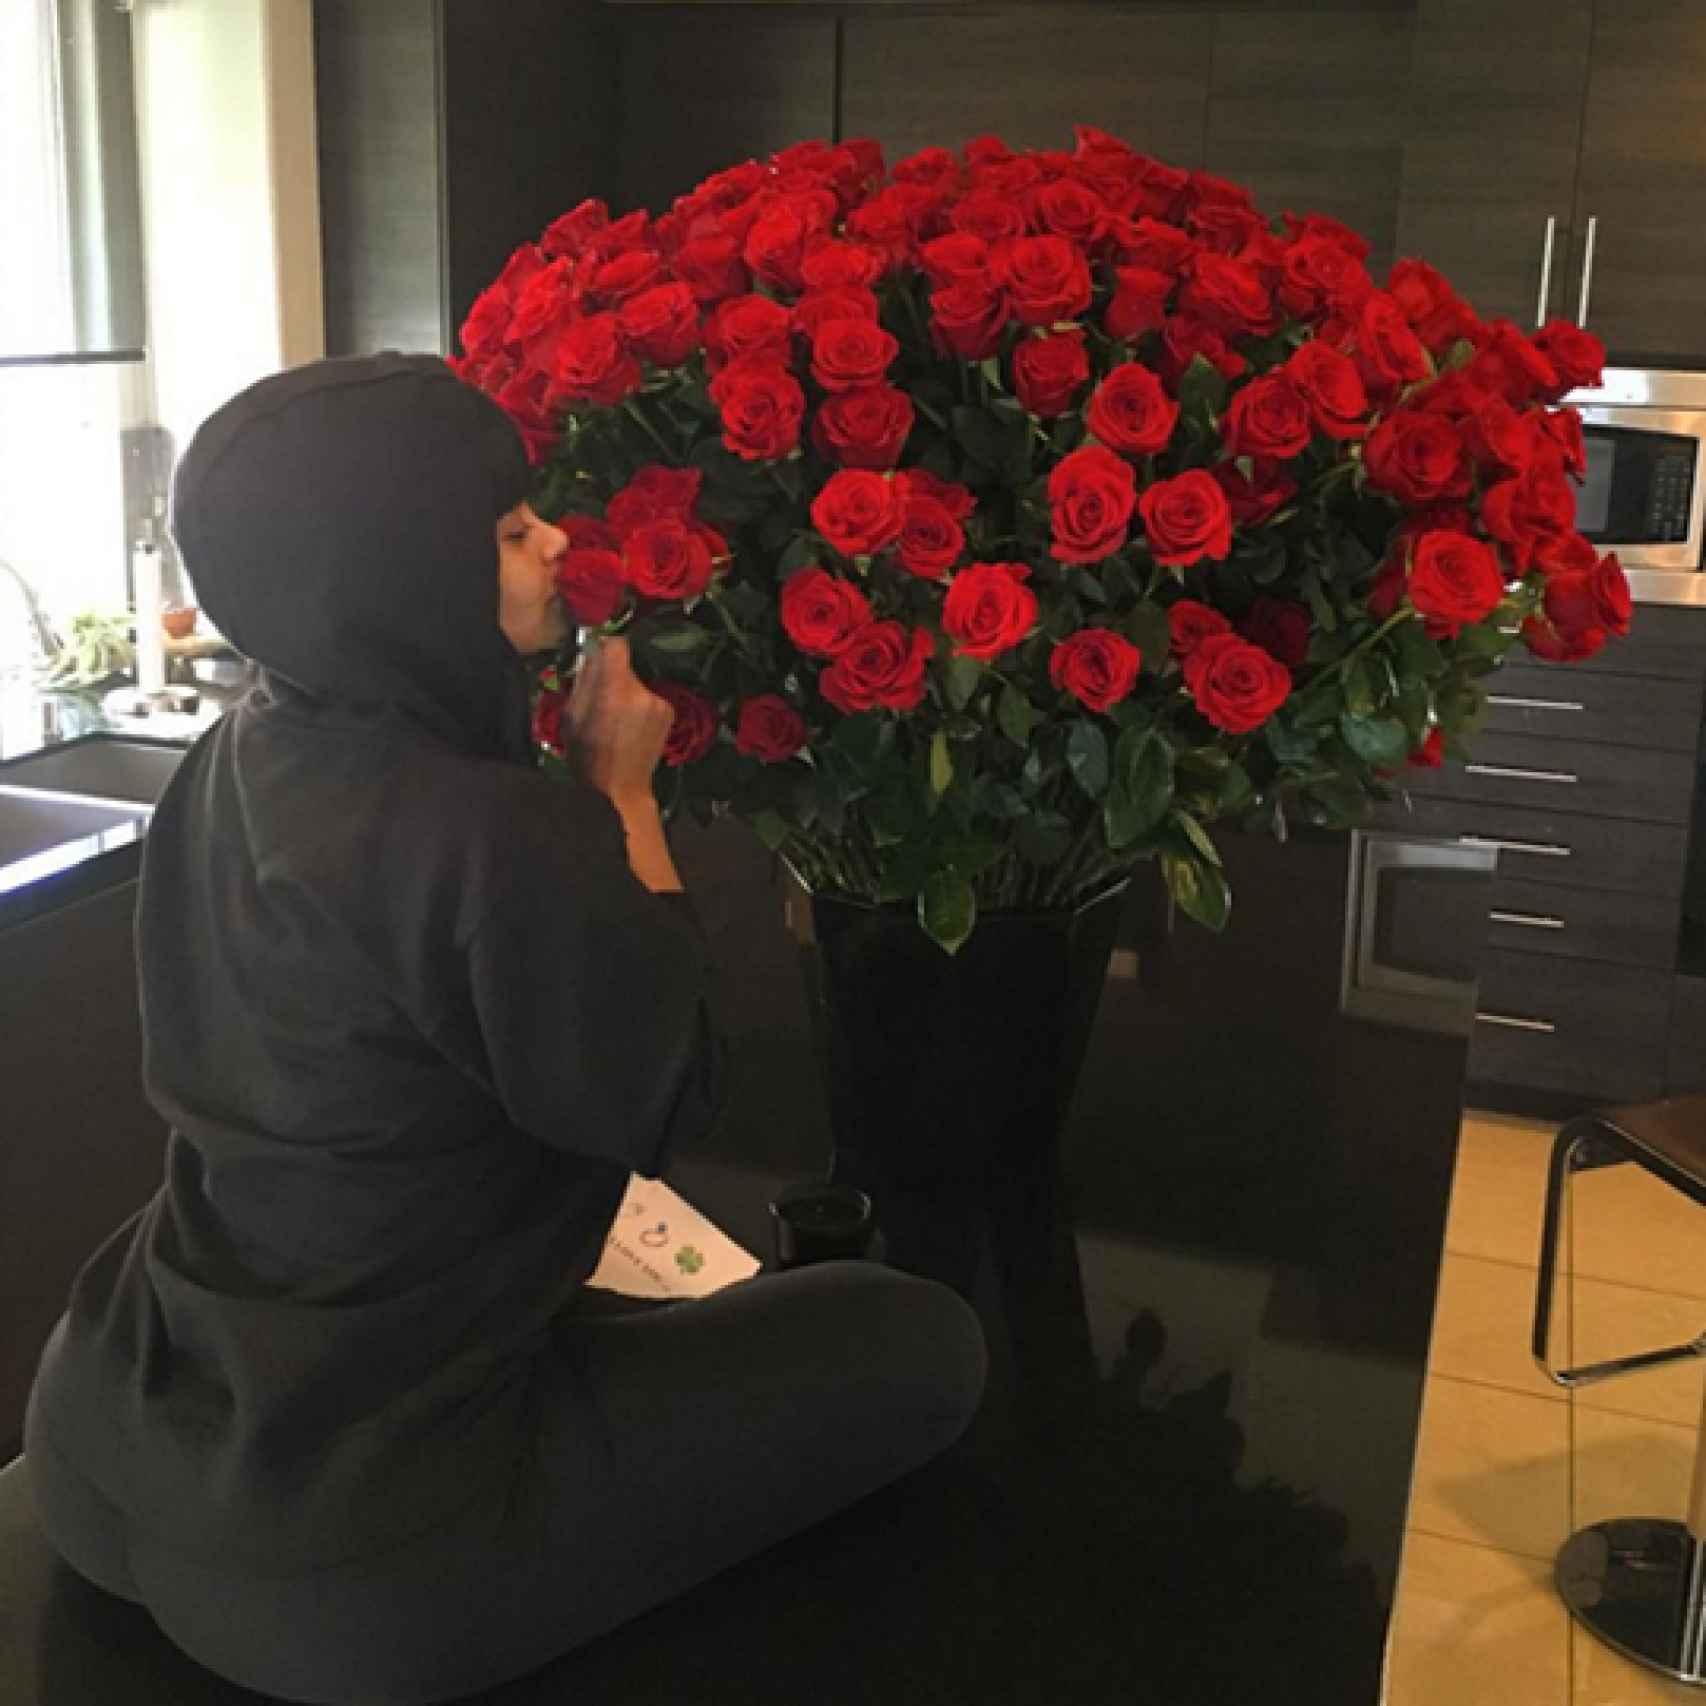 Blac Chyna recibe el ramo de Robert Kardashian de más de 100 rosas